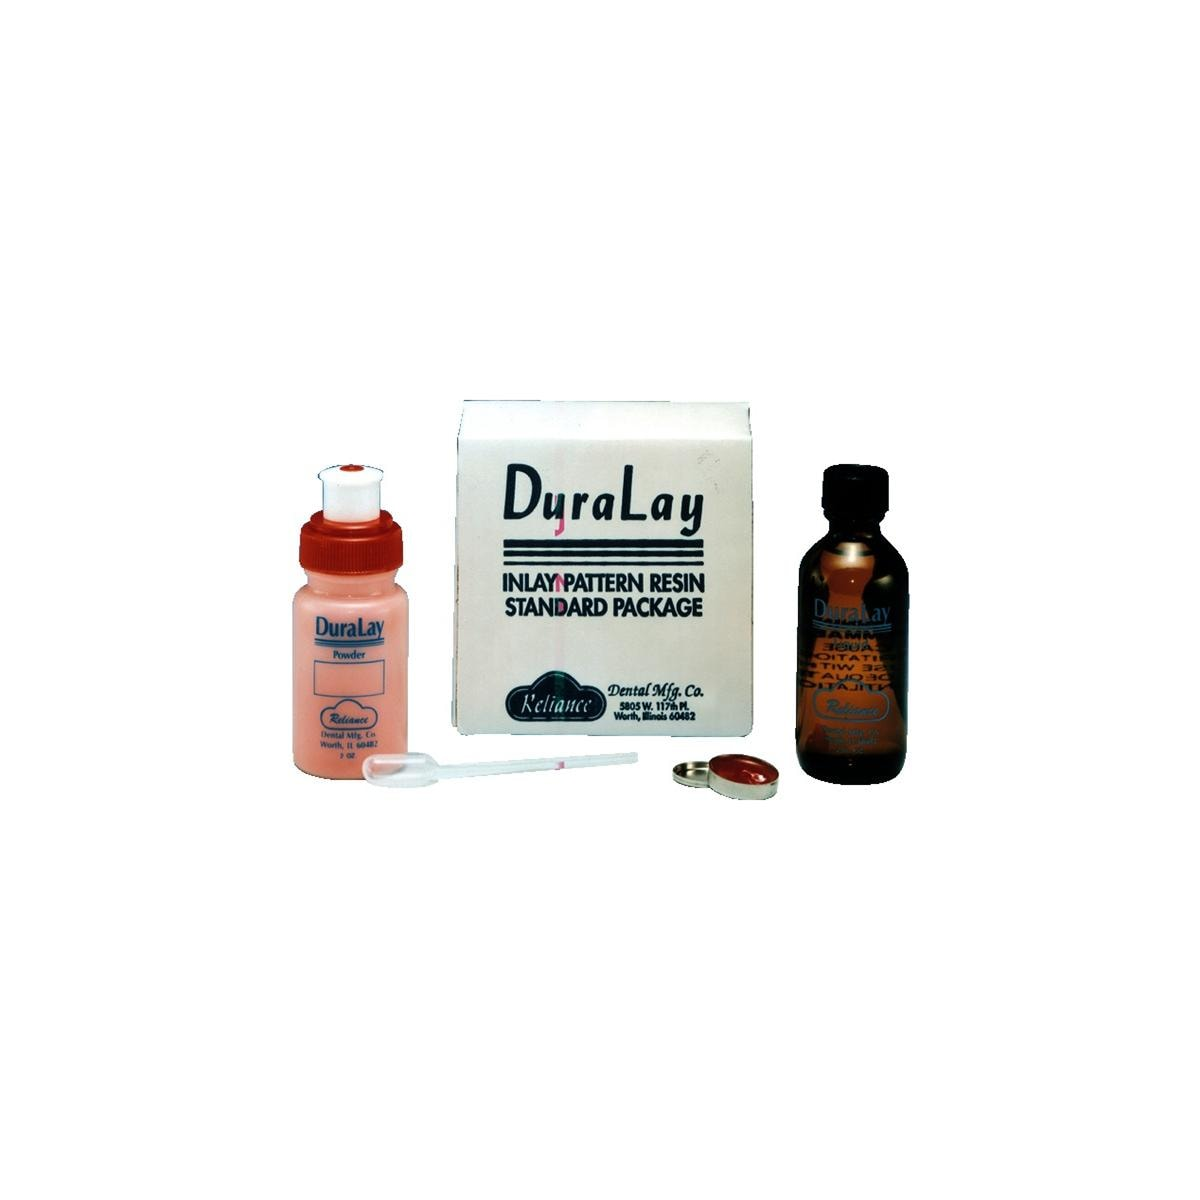 Duralay I Inlay Resin Standard Kit